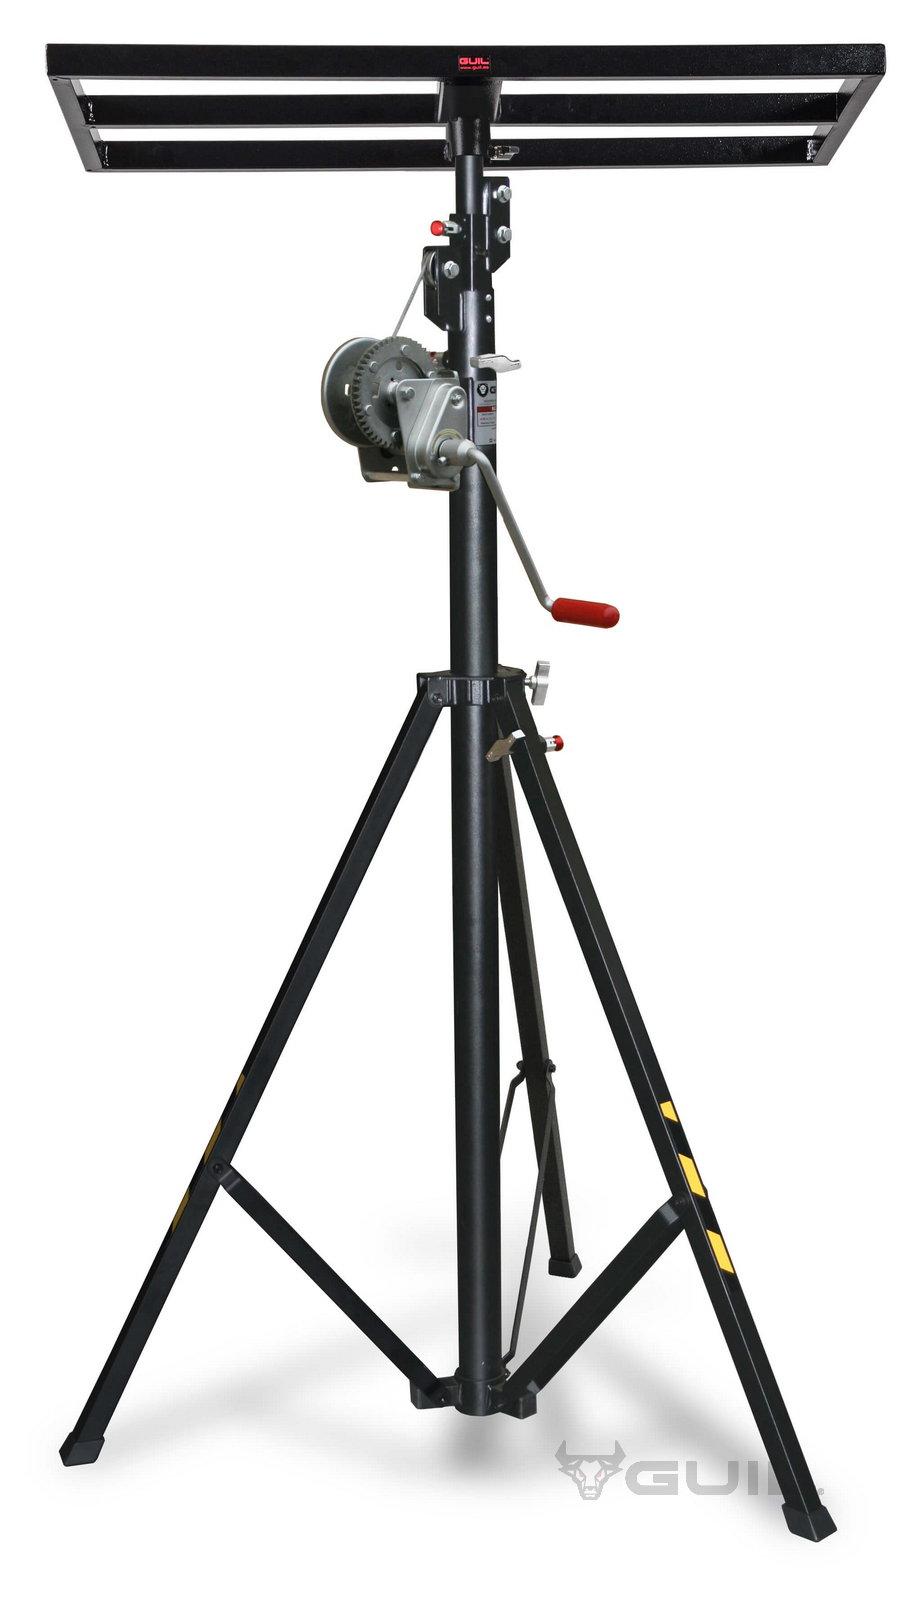 Materiaallift 1,7-4,0 m 100 kg (dutch) (6)